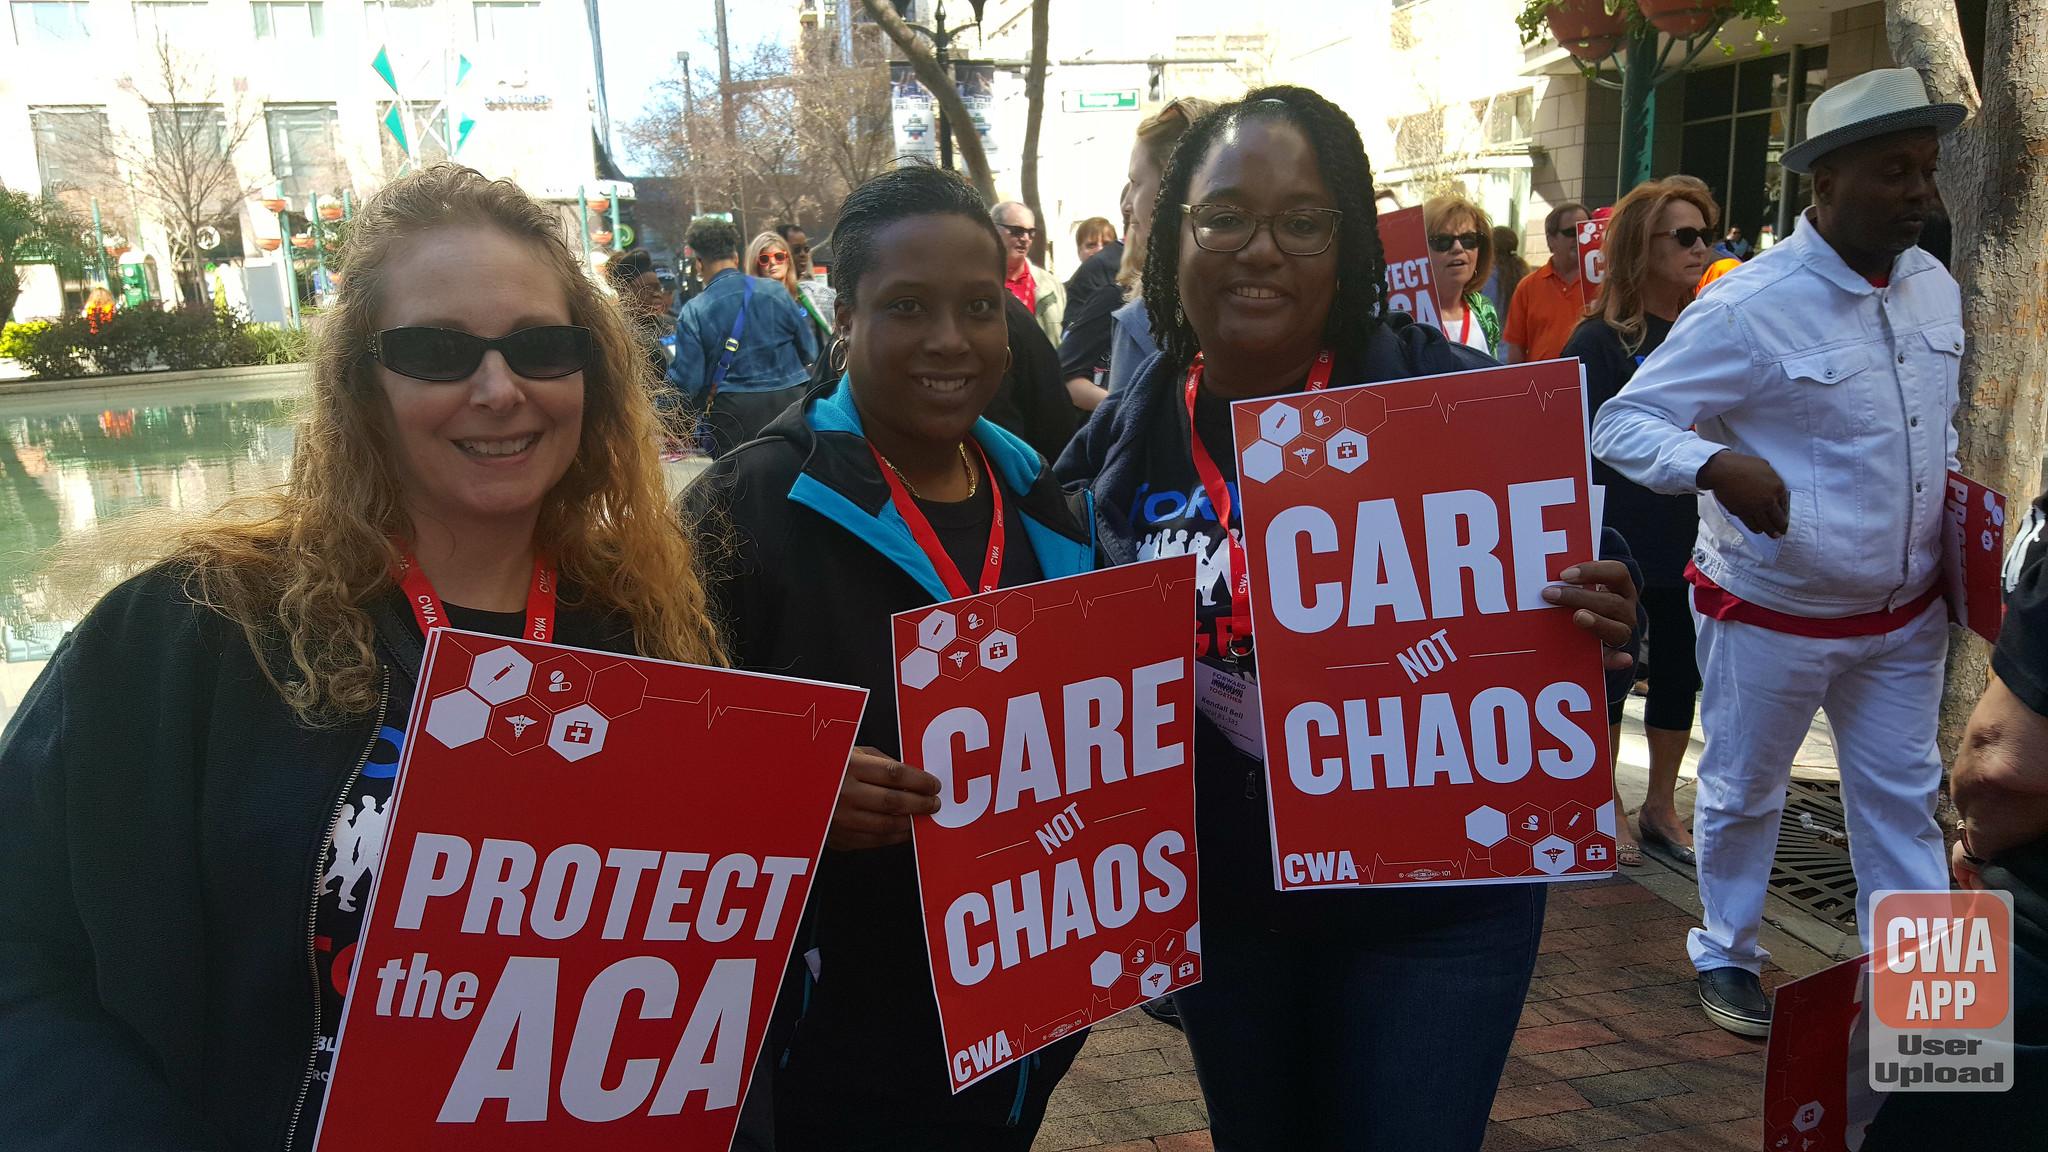 Orlando Rally to Defend the ACA